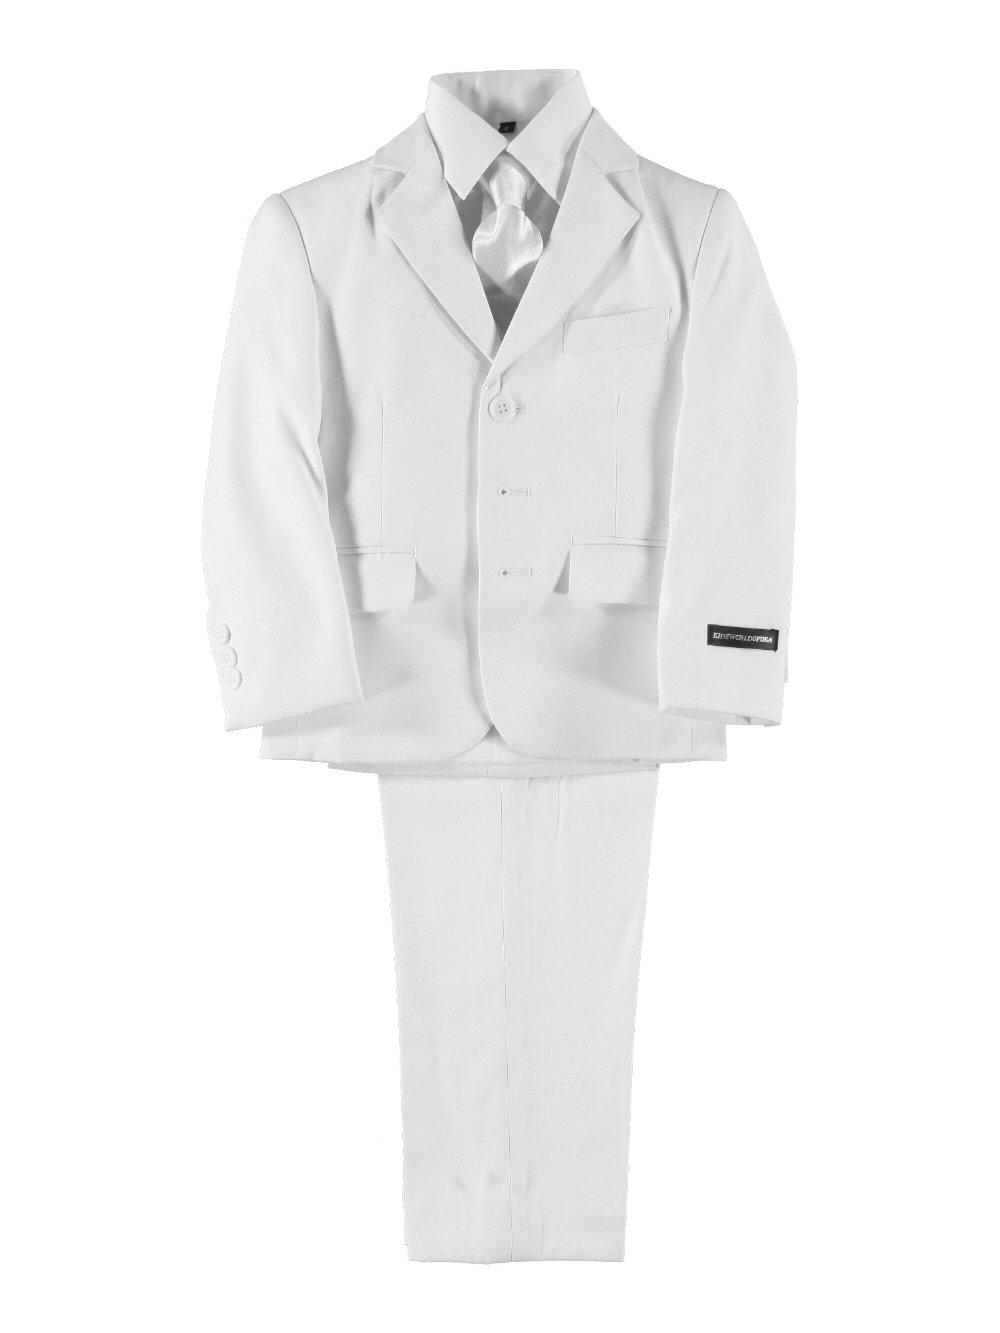 Kids World ''Floe 5-Piece Suit - white, 3t